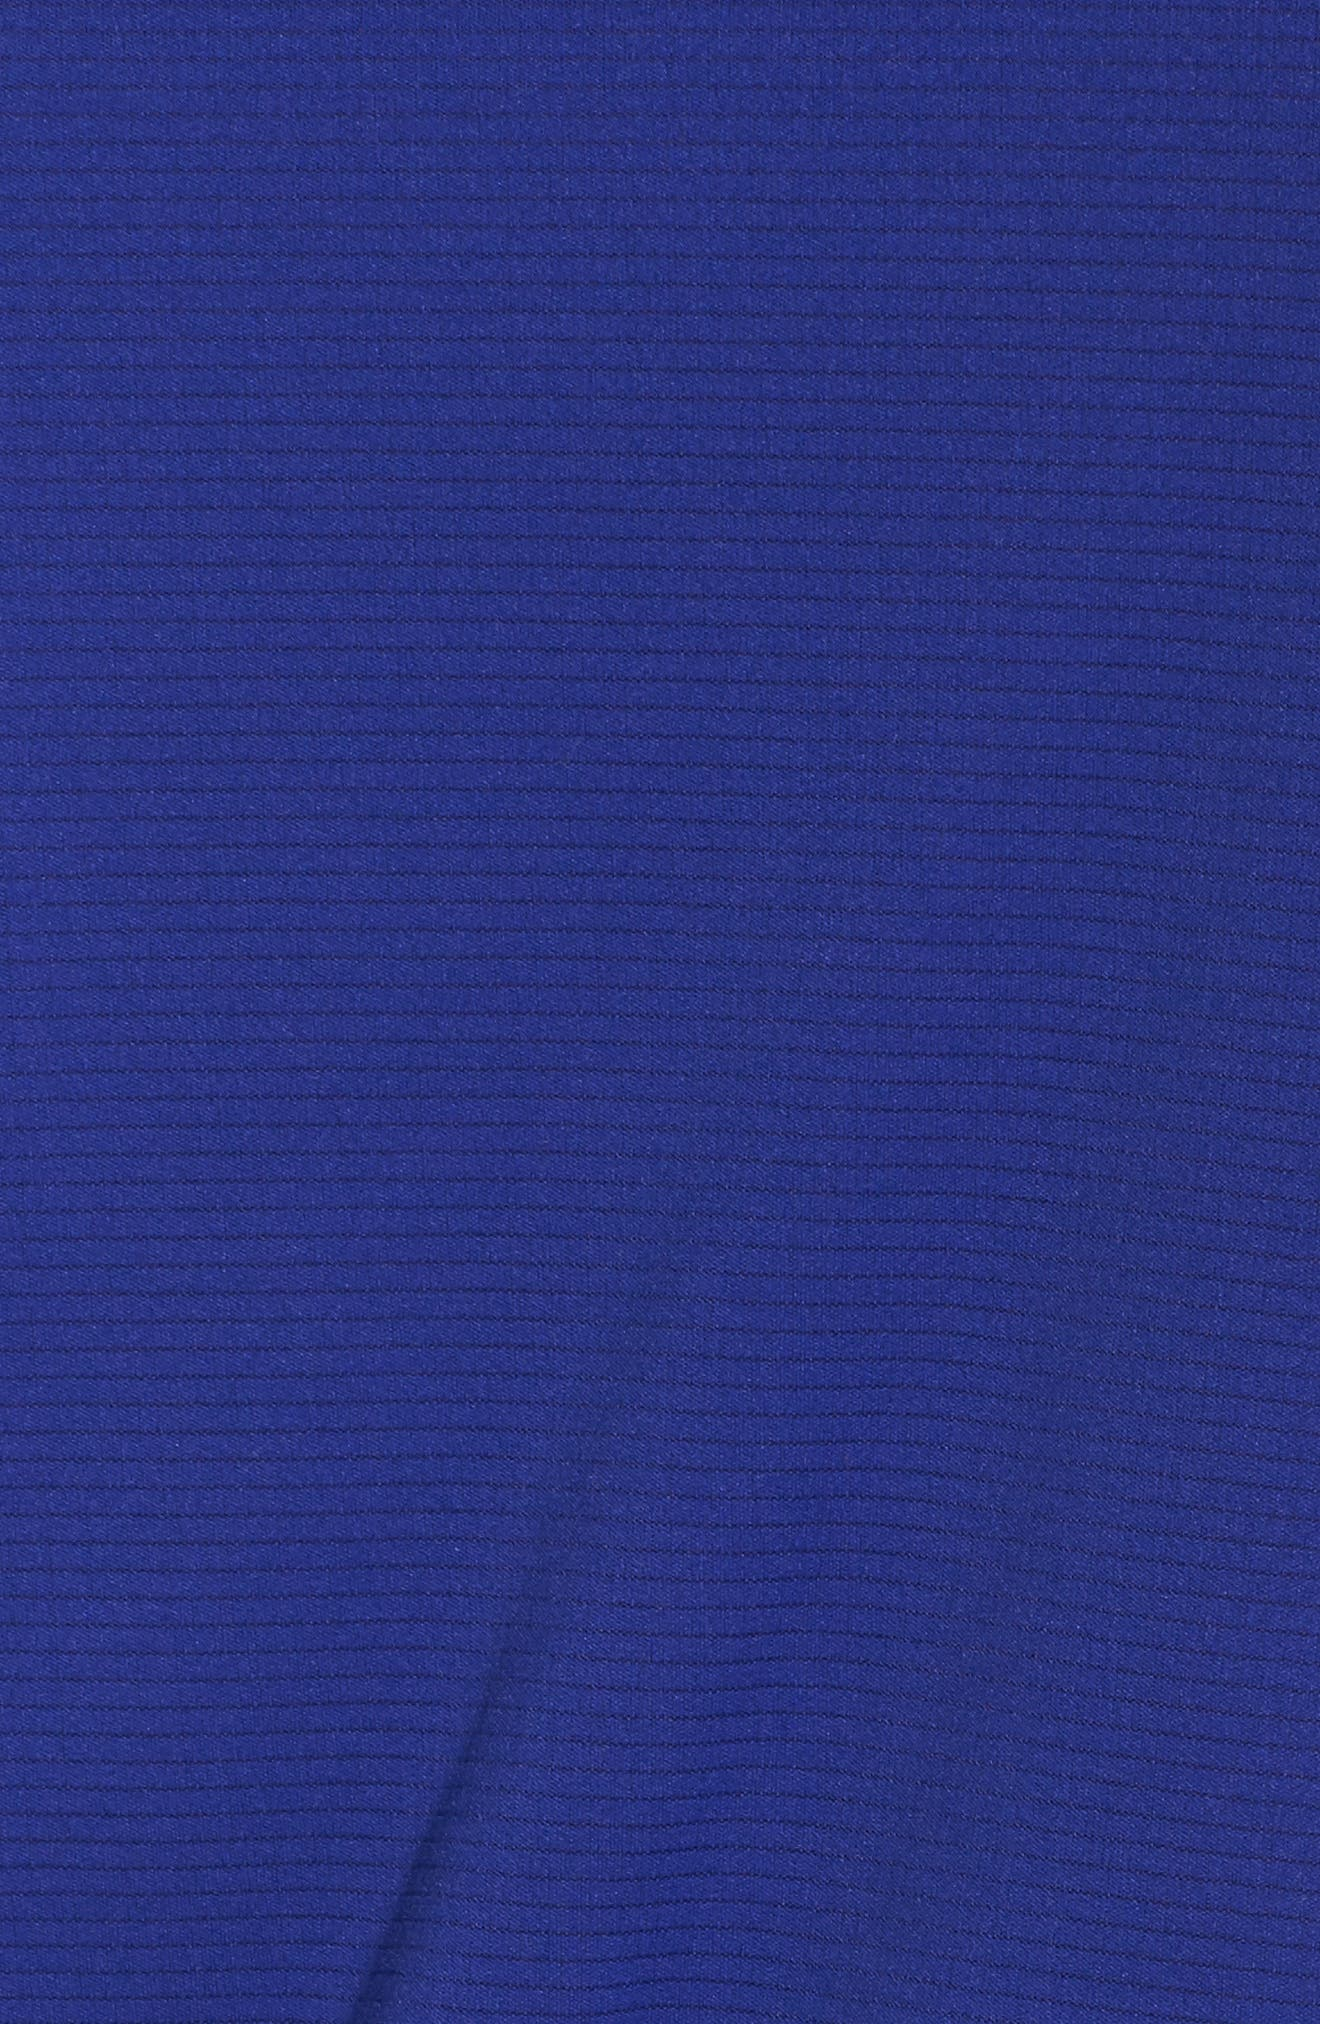 Lightweight Capilene<sup>®</sup> Long-Sleeve Tee,                             Alternate thumbnail 5, color,                             Cobalt Blue